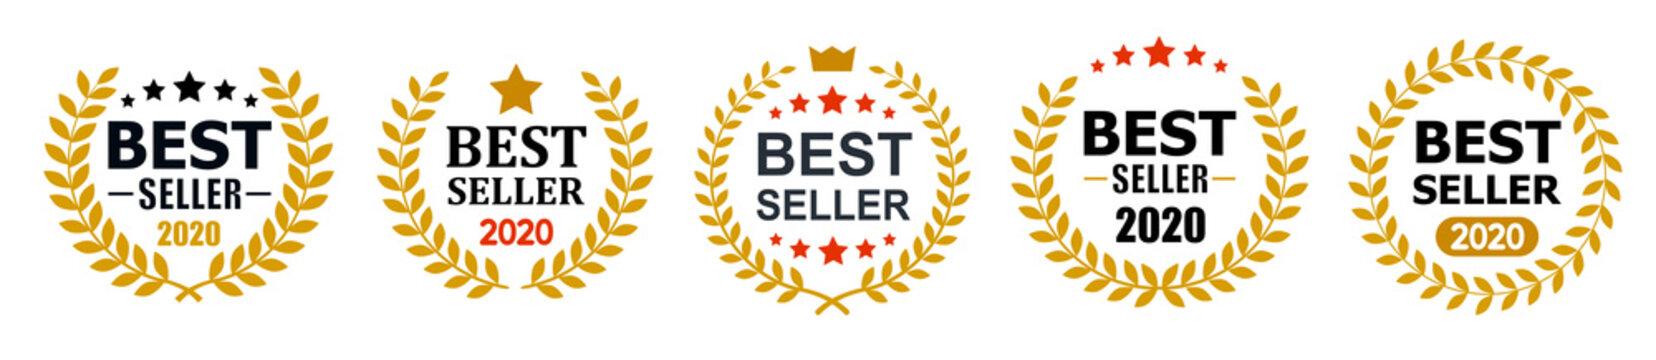 Set best seller icon design with laurel, best seller badge logo isolated - stock vector